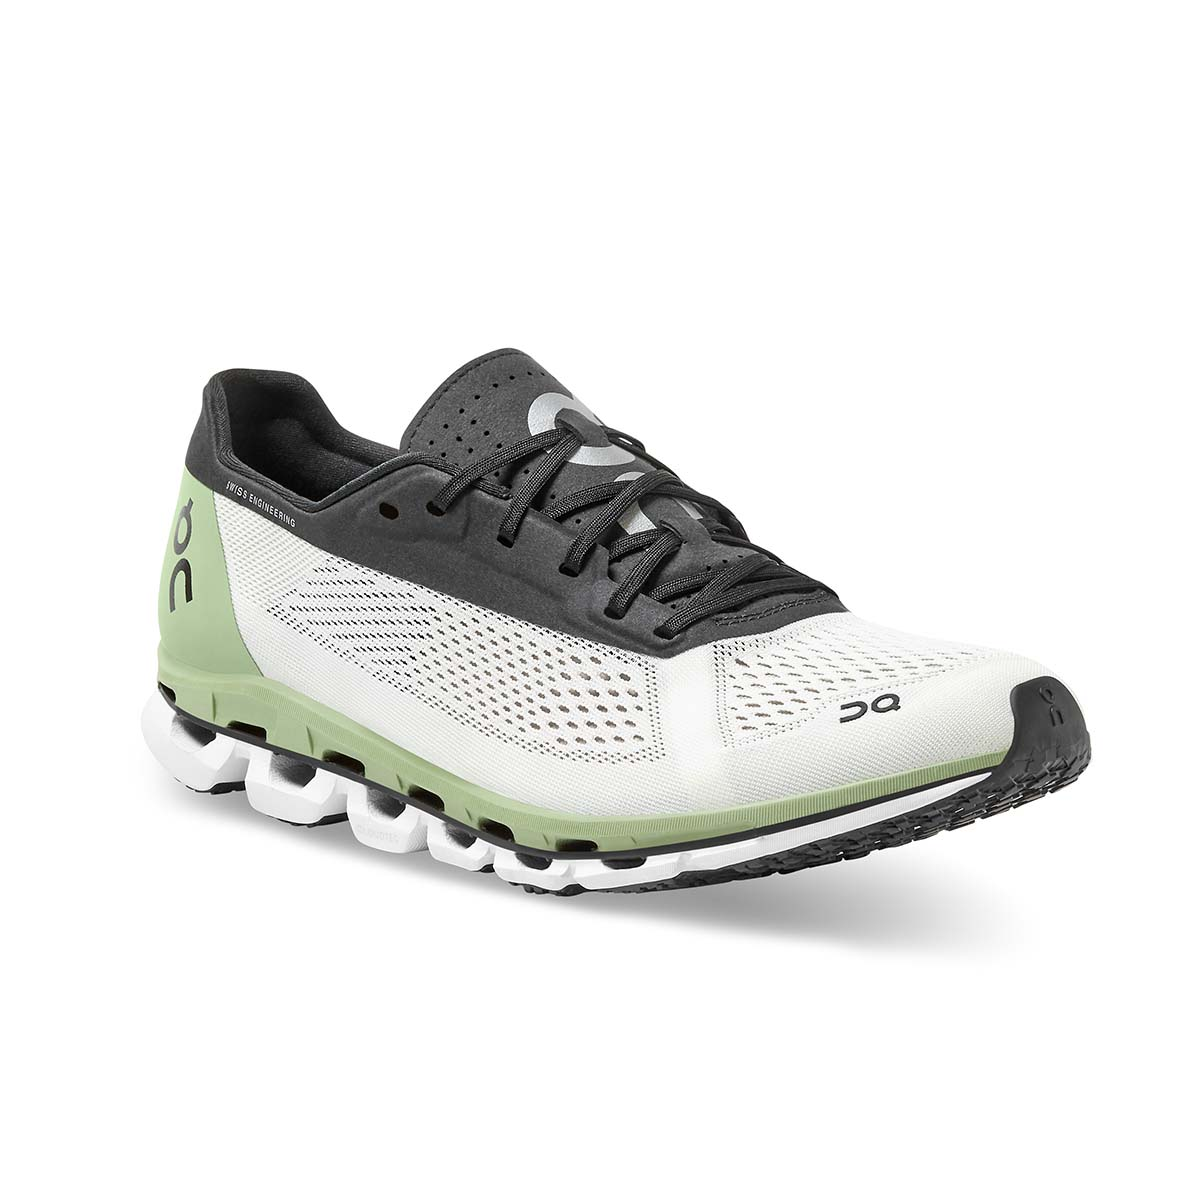 Men's On Cloudboom Running Shoe - Color: White/Black - Size: 7 - Width: Regular, White/Black, large, image 2